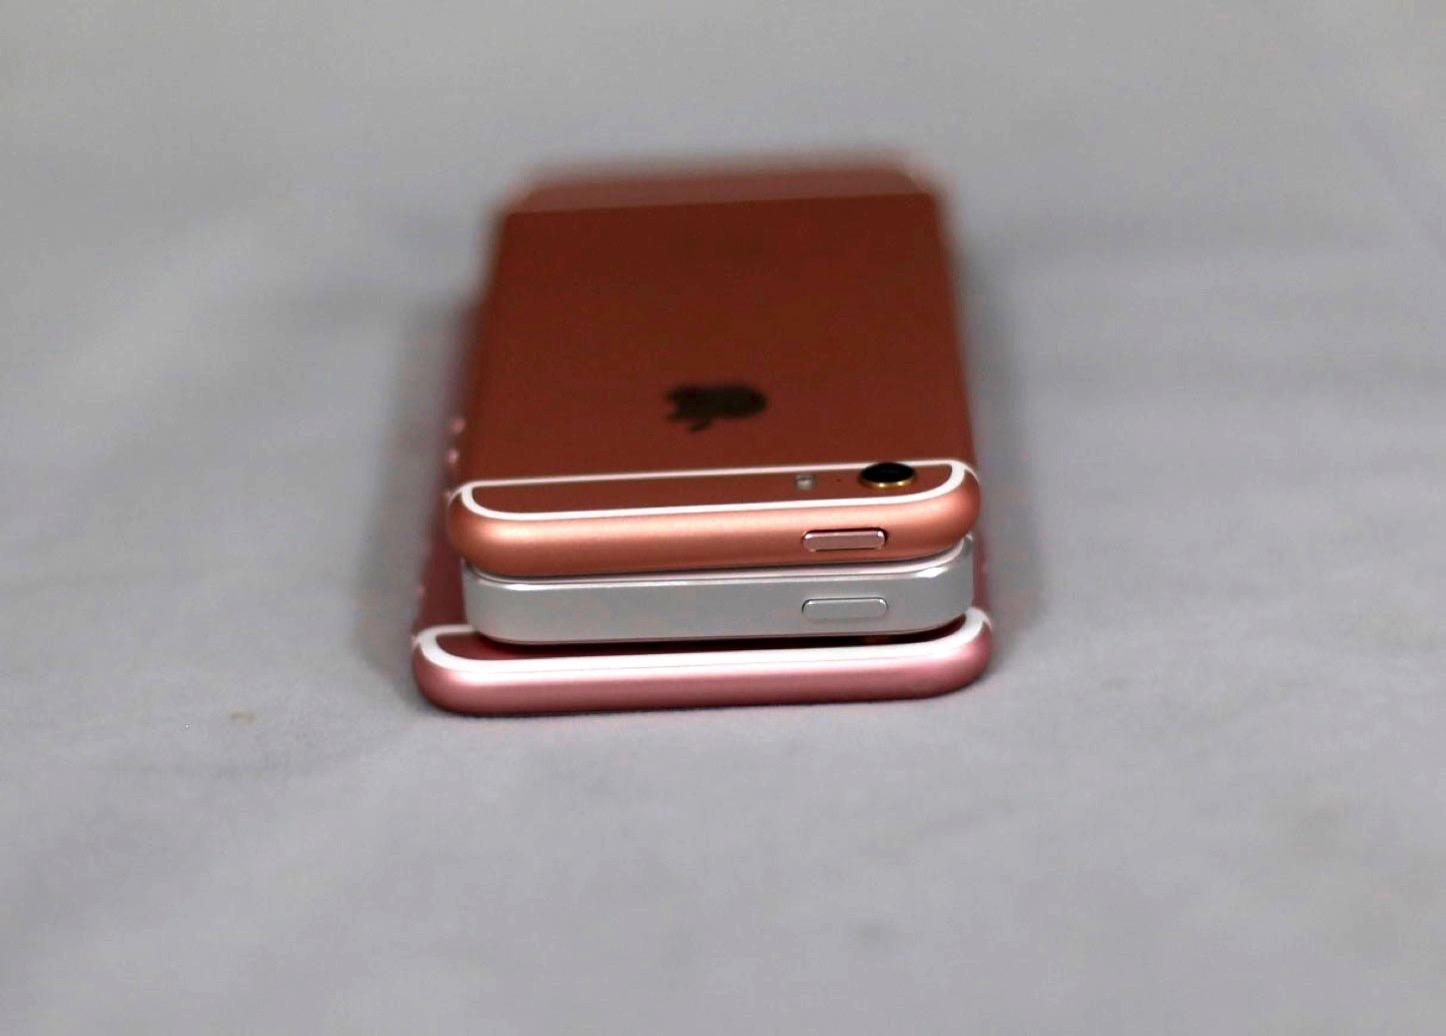 iPhone-SE-Fake-Samples-from-China-08.jpg